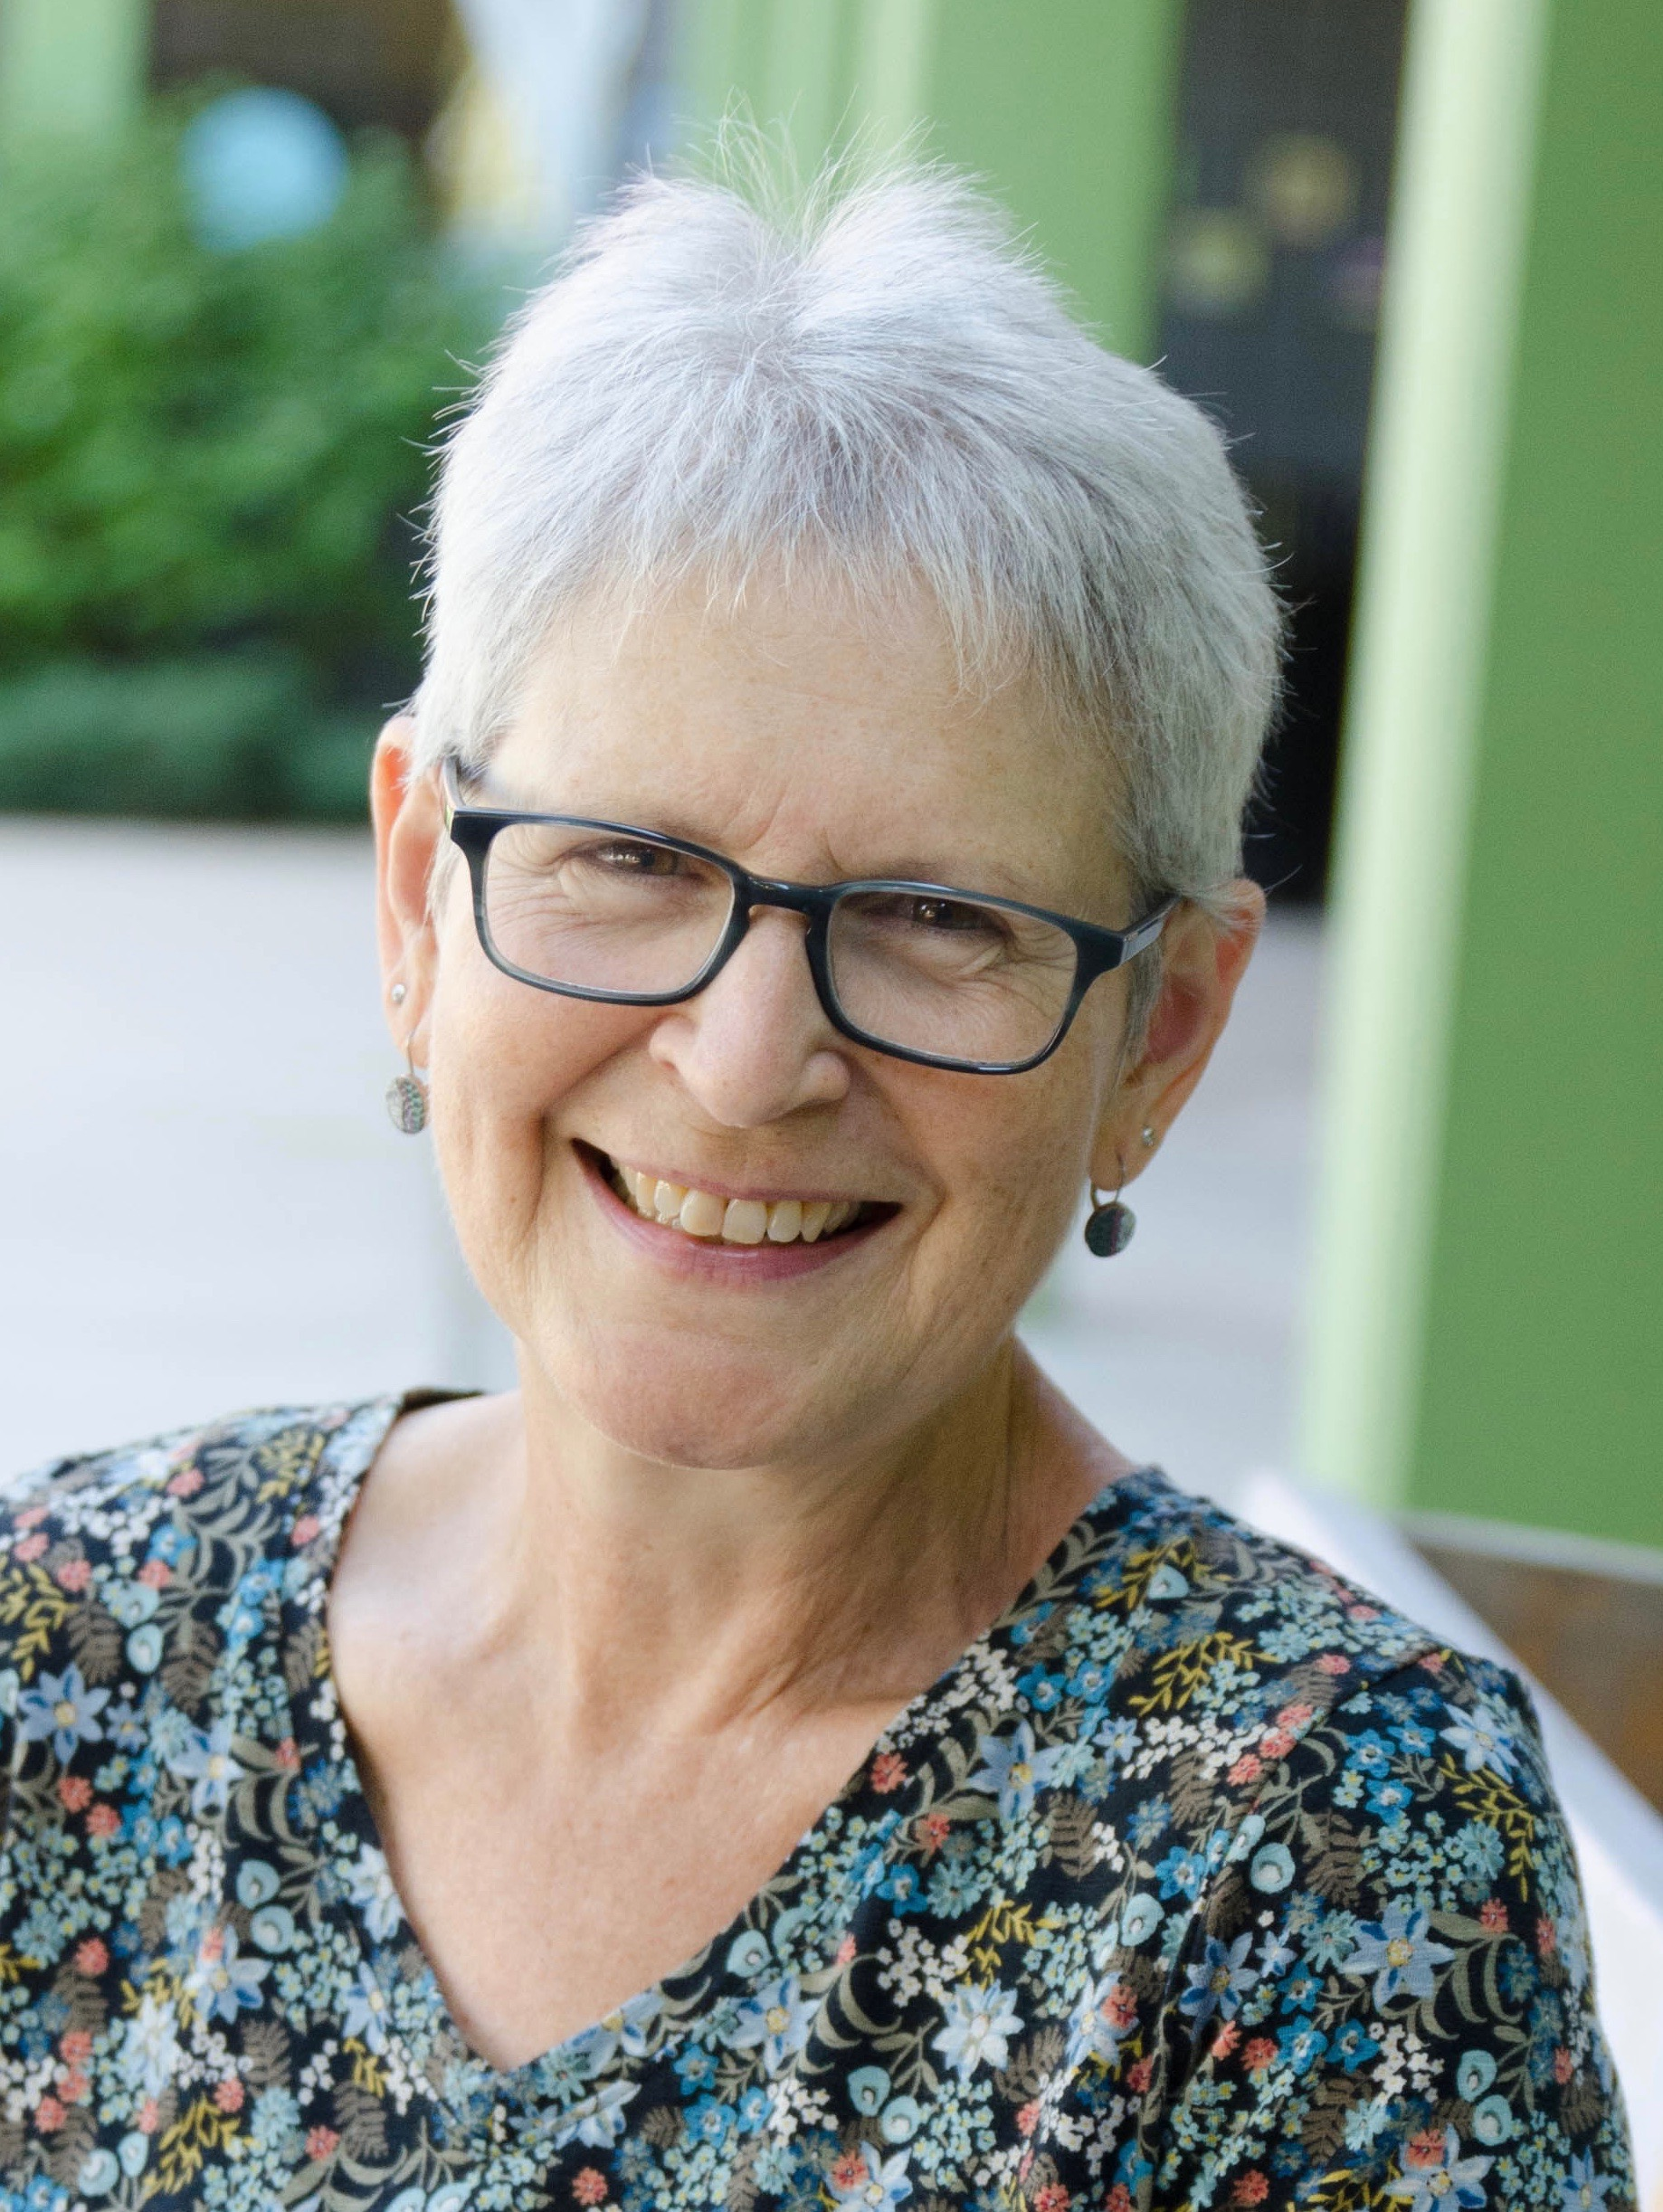 celebrate-picture-books-picture-book-review-Ellen-Mayer-headshot